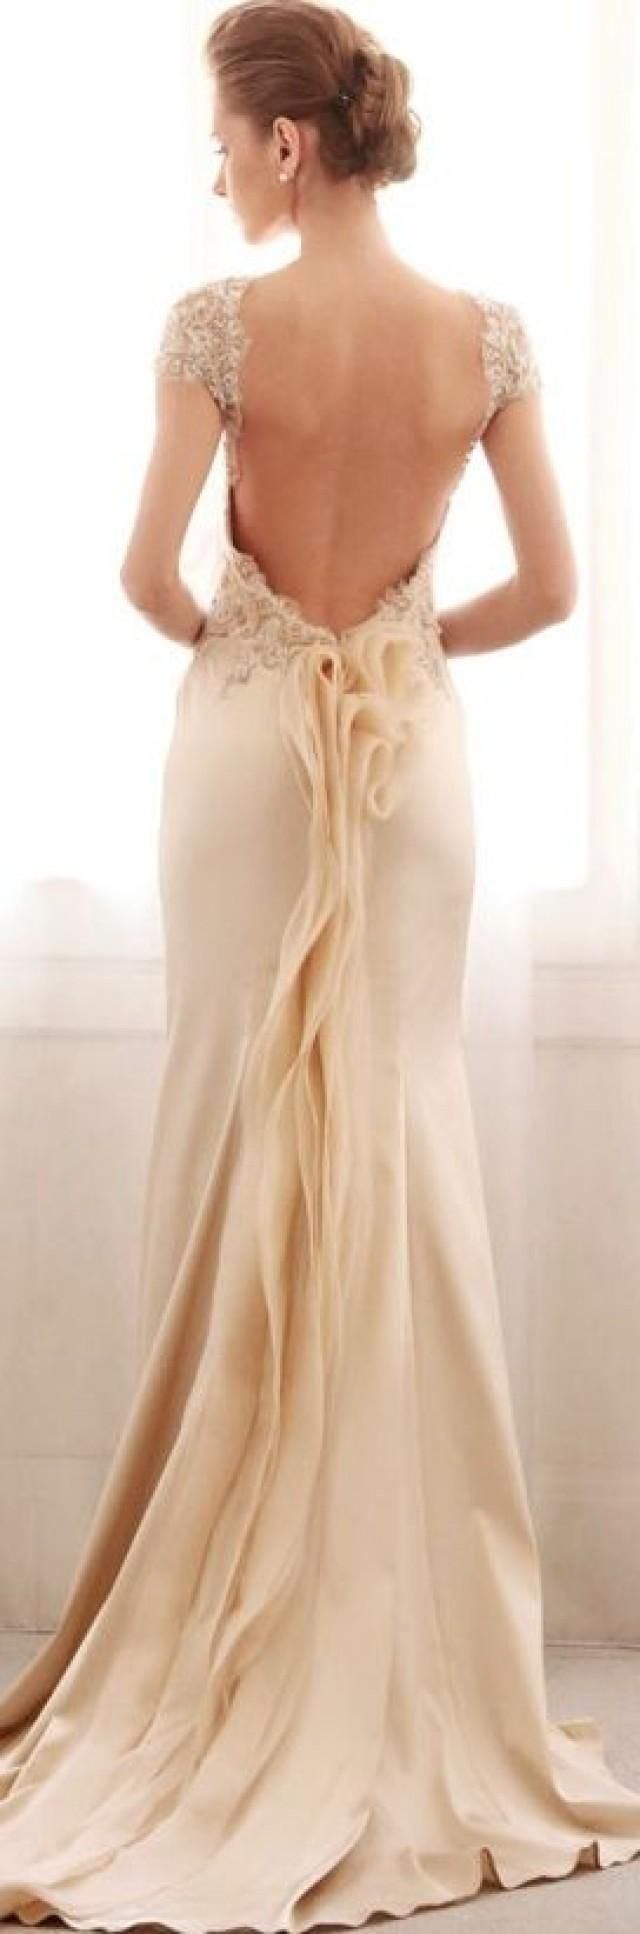 Gerry Maalouf.... oh wow.... wow....wow.....love the back......